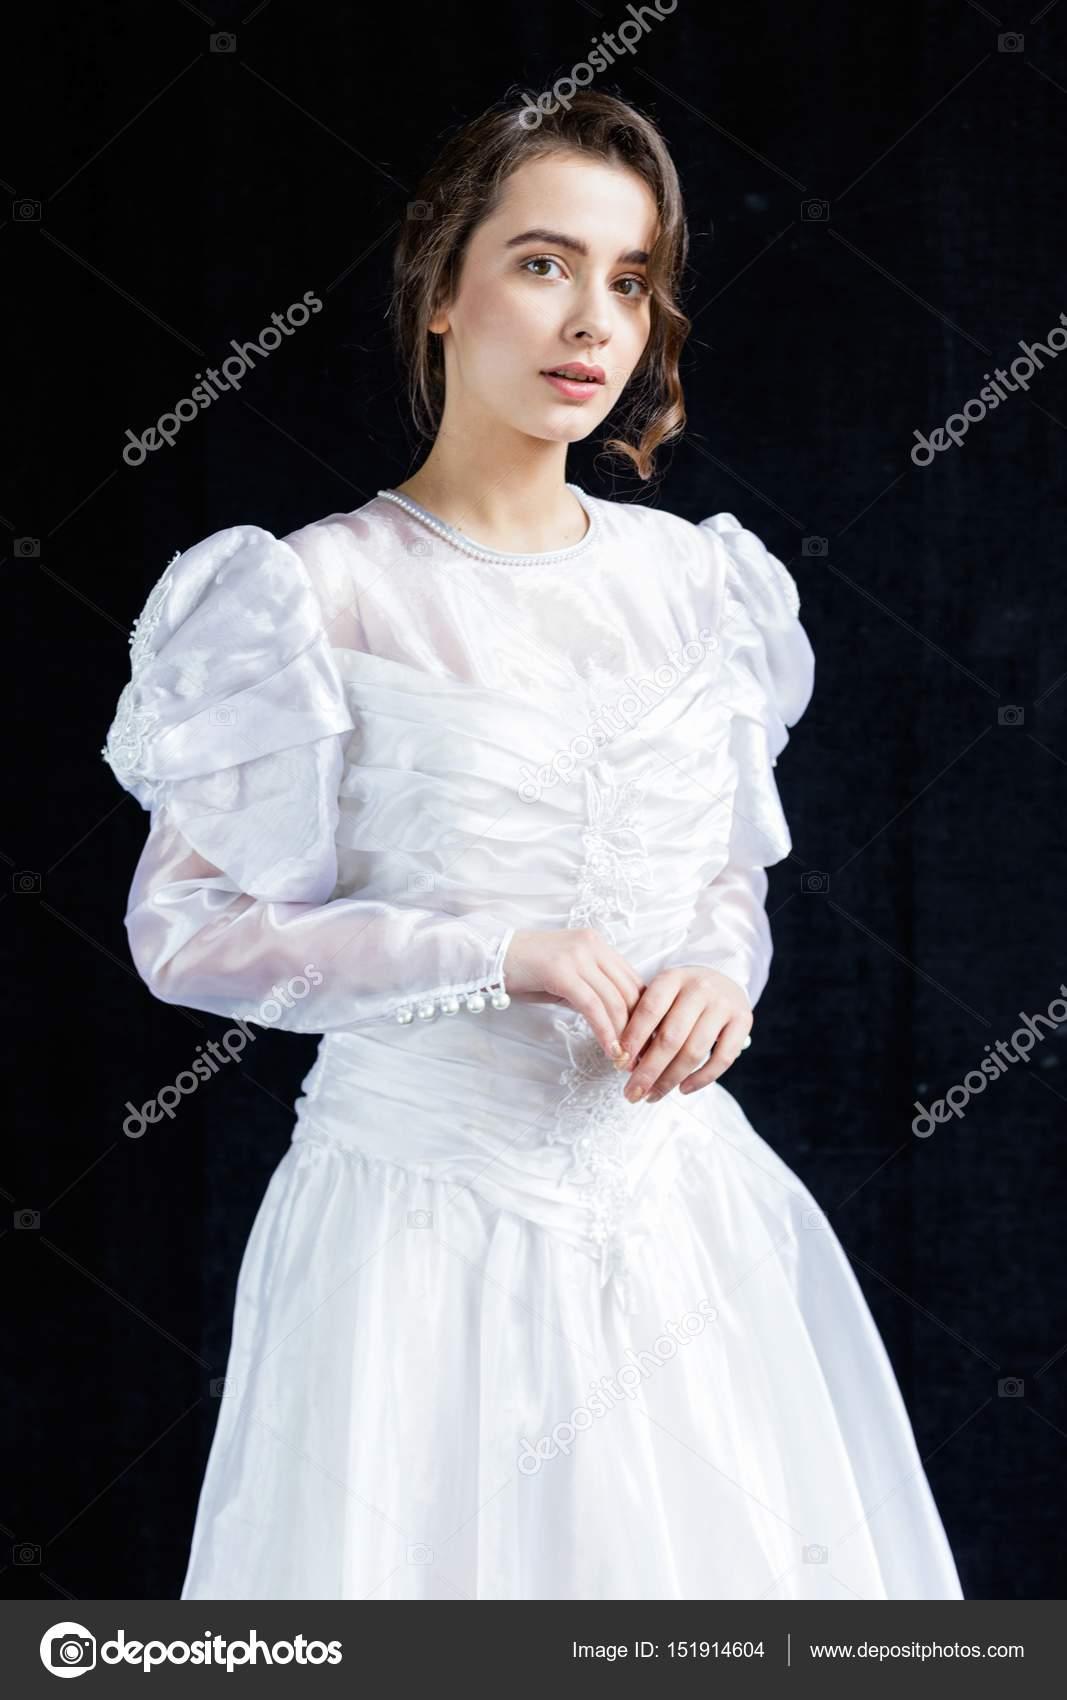 Frau in Vintage Brautkleid — Stockfoto © smmartynenko #151914604